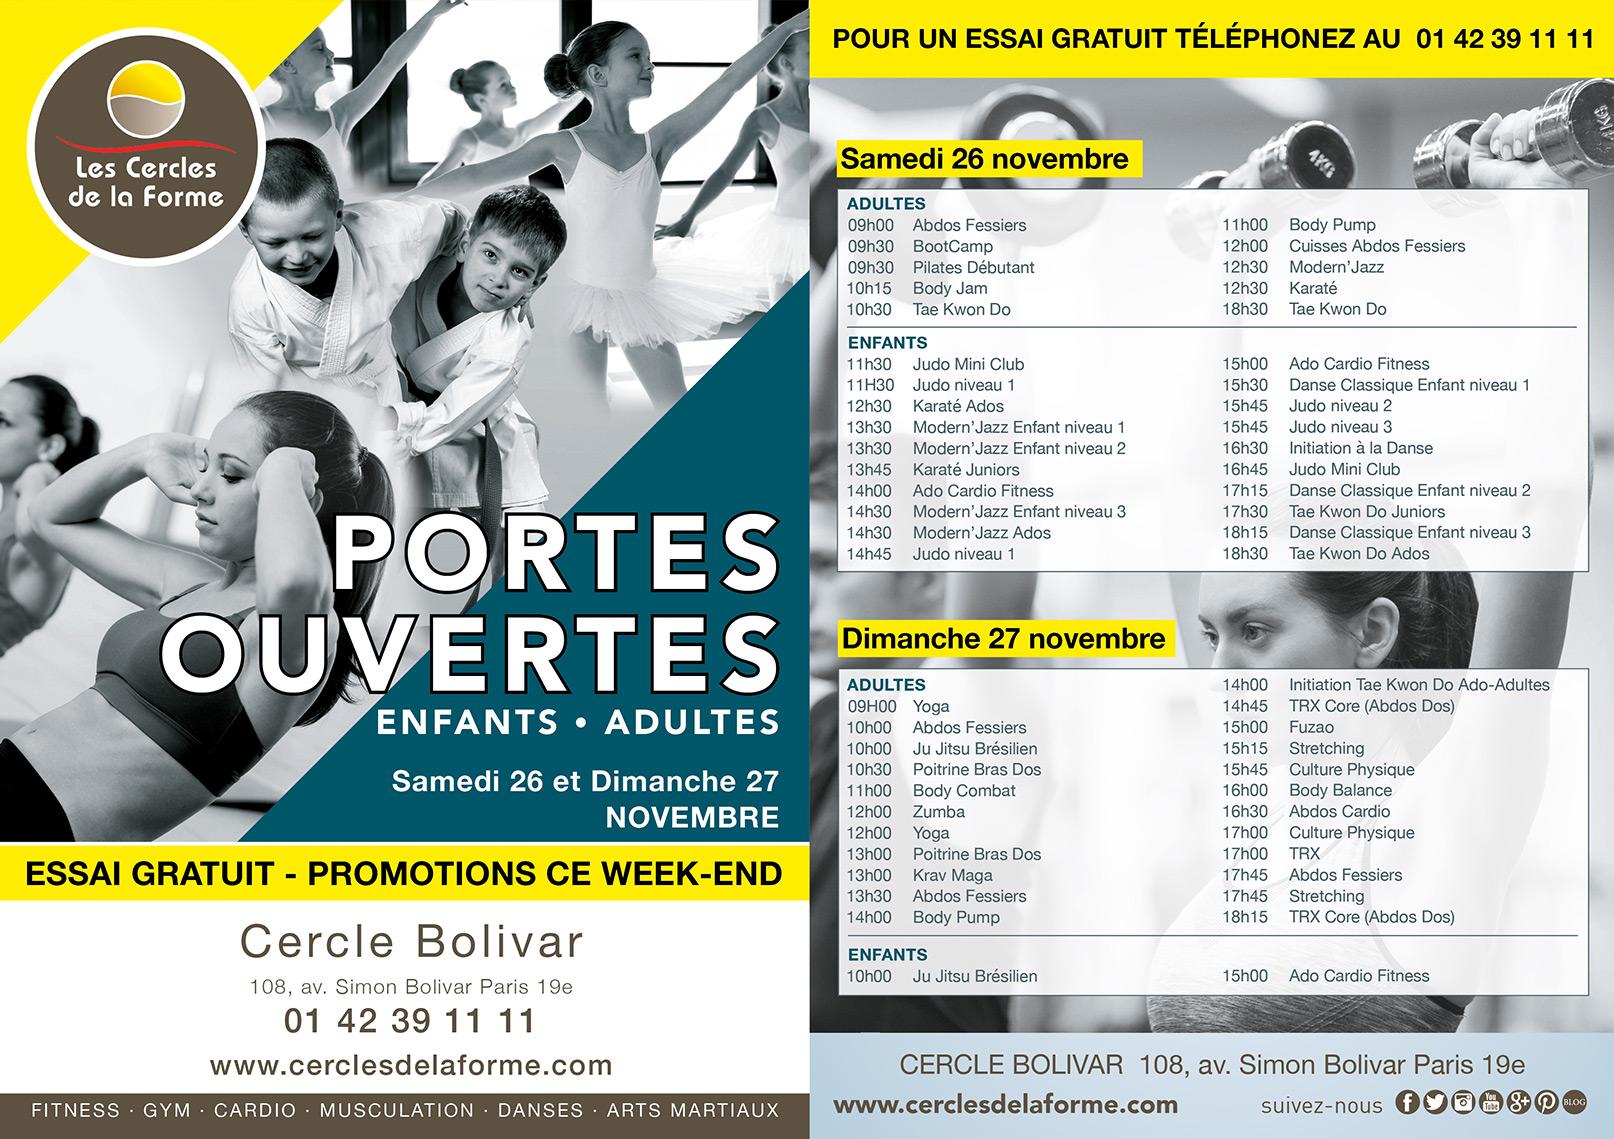 programme-portes-ouvertes-cercle-bolivar-2016